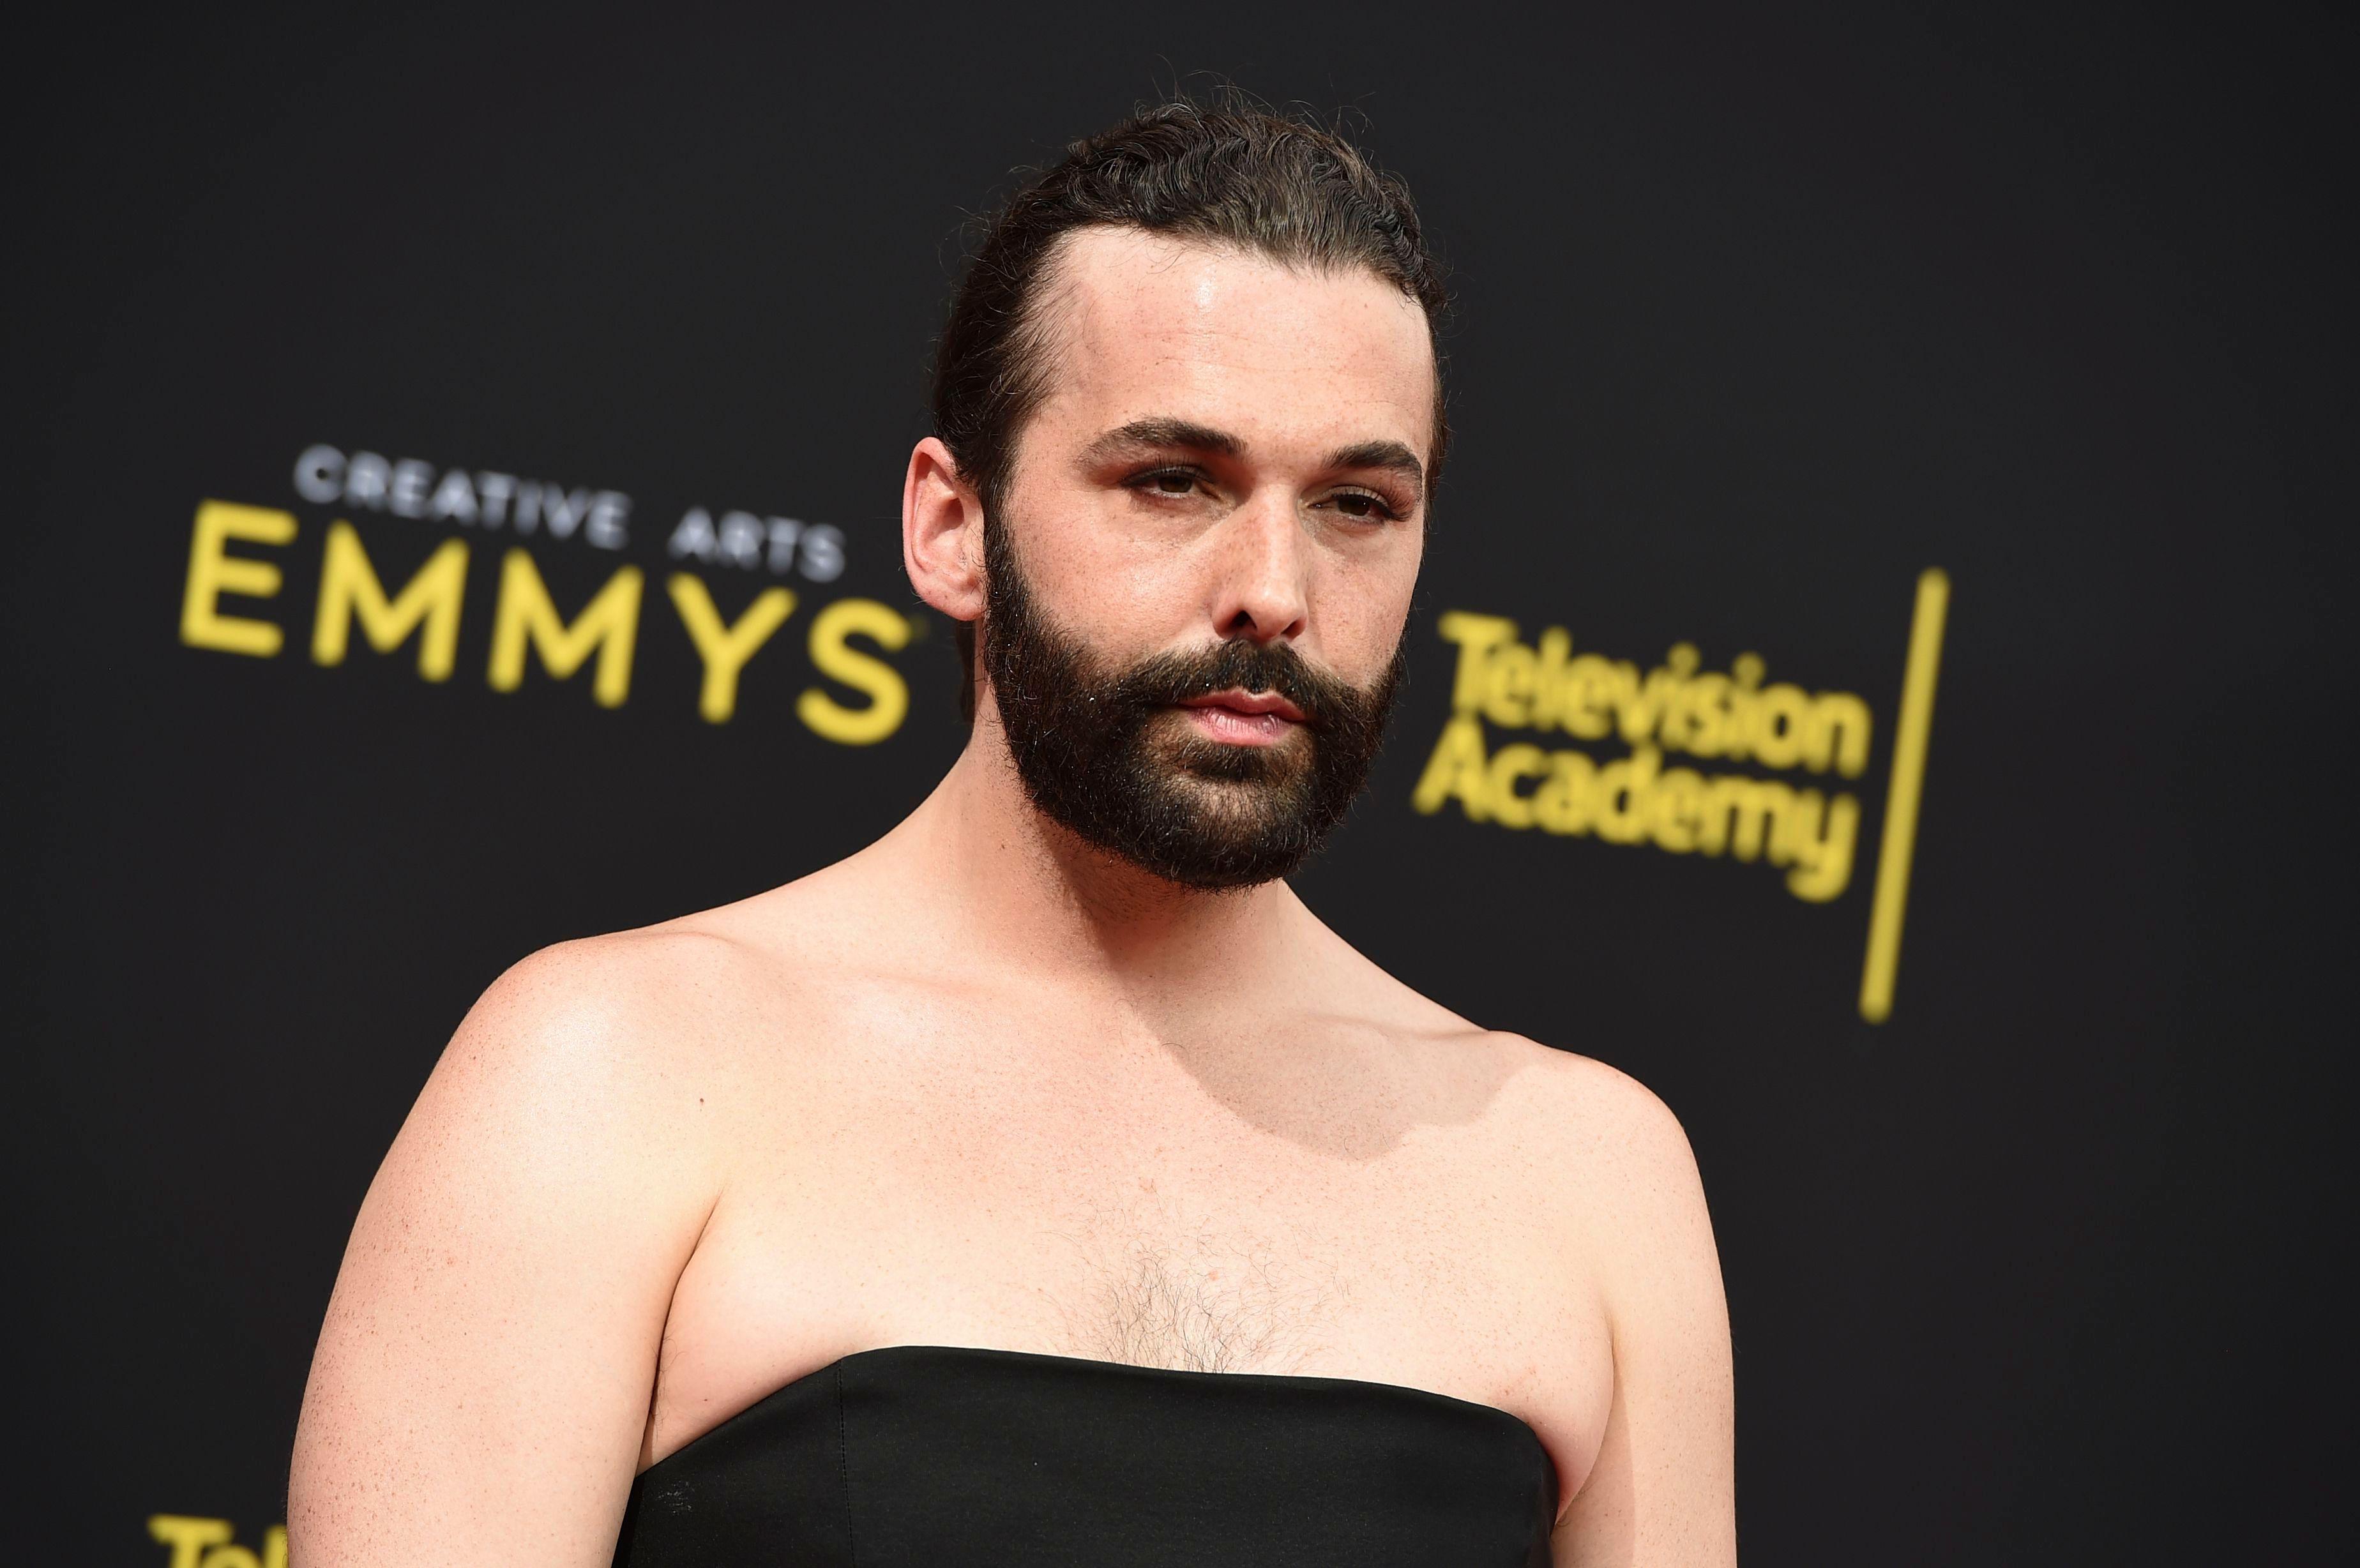 Queer Eye Star Jonathan Van Ness Reveals Devastating Hiv Positive Diagnosis Deadline